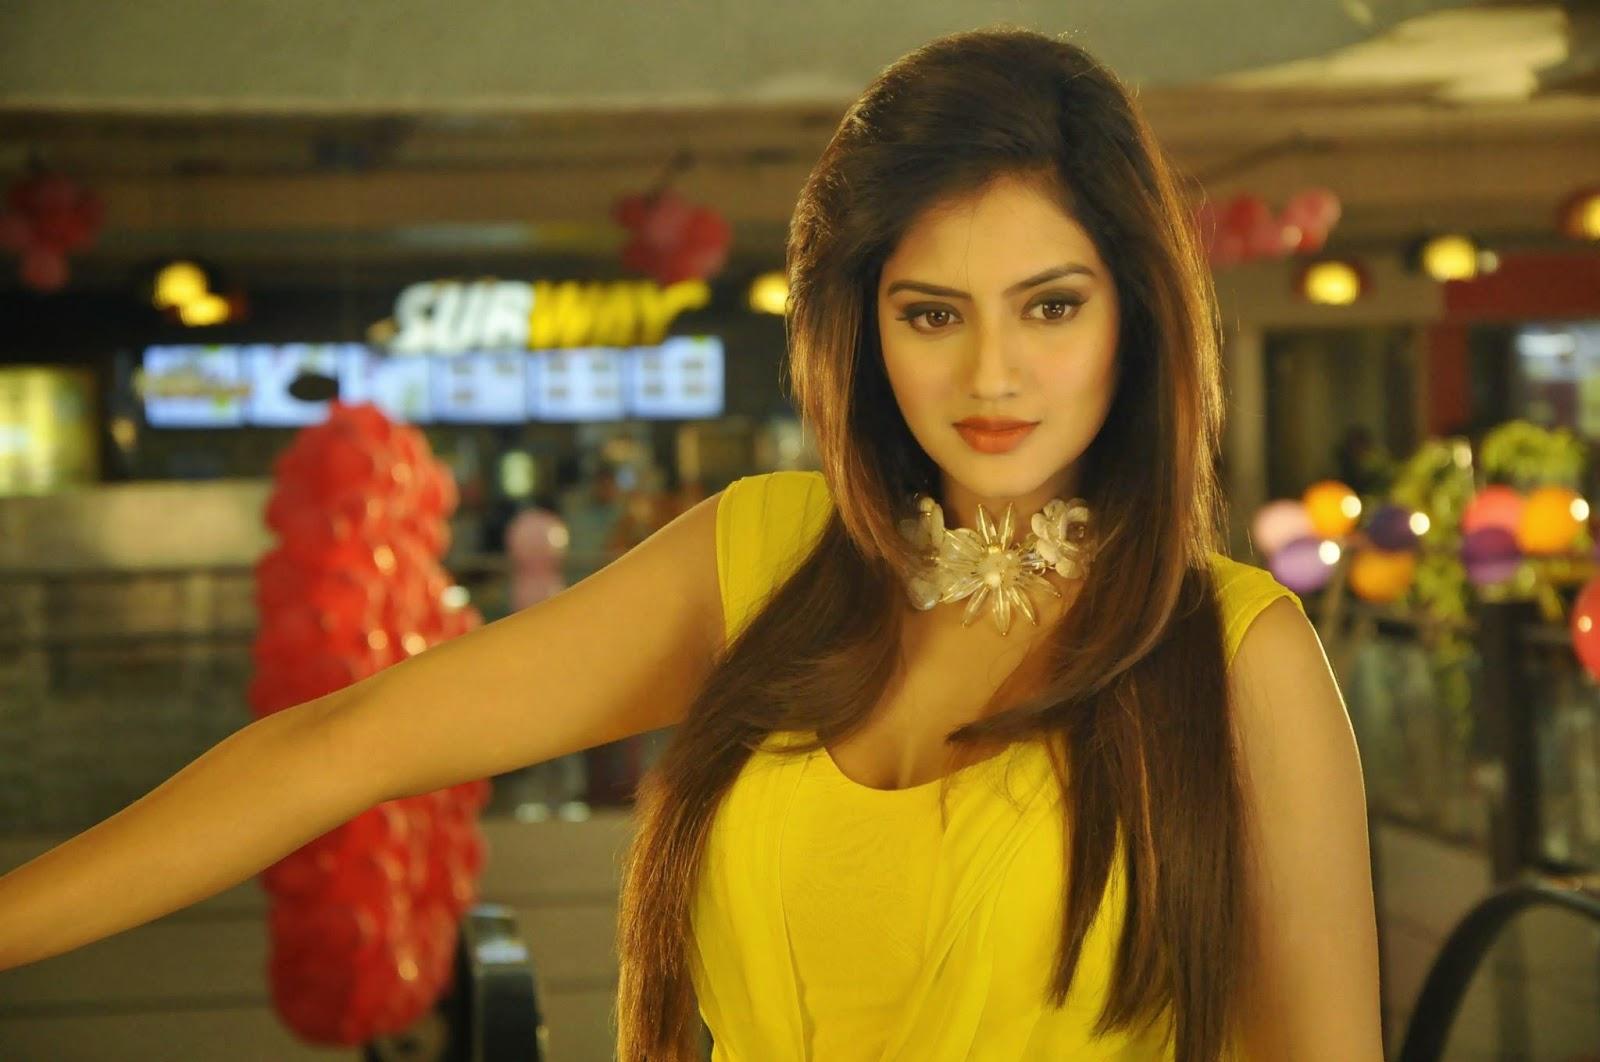 Sexy Hindi Movie Download Hd